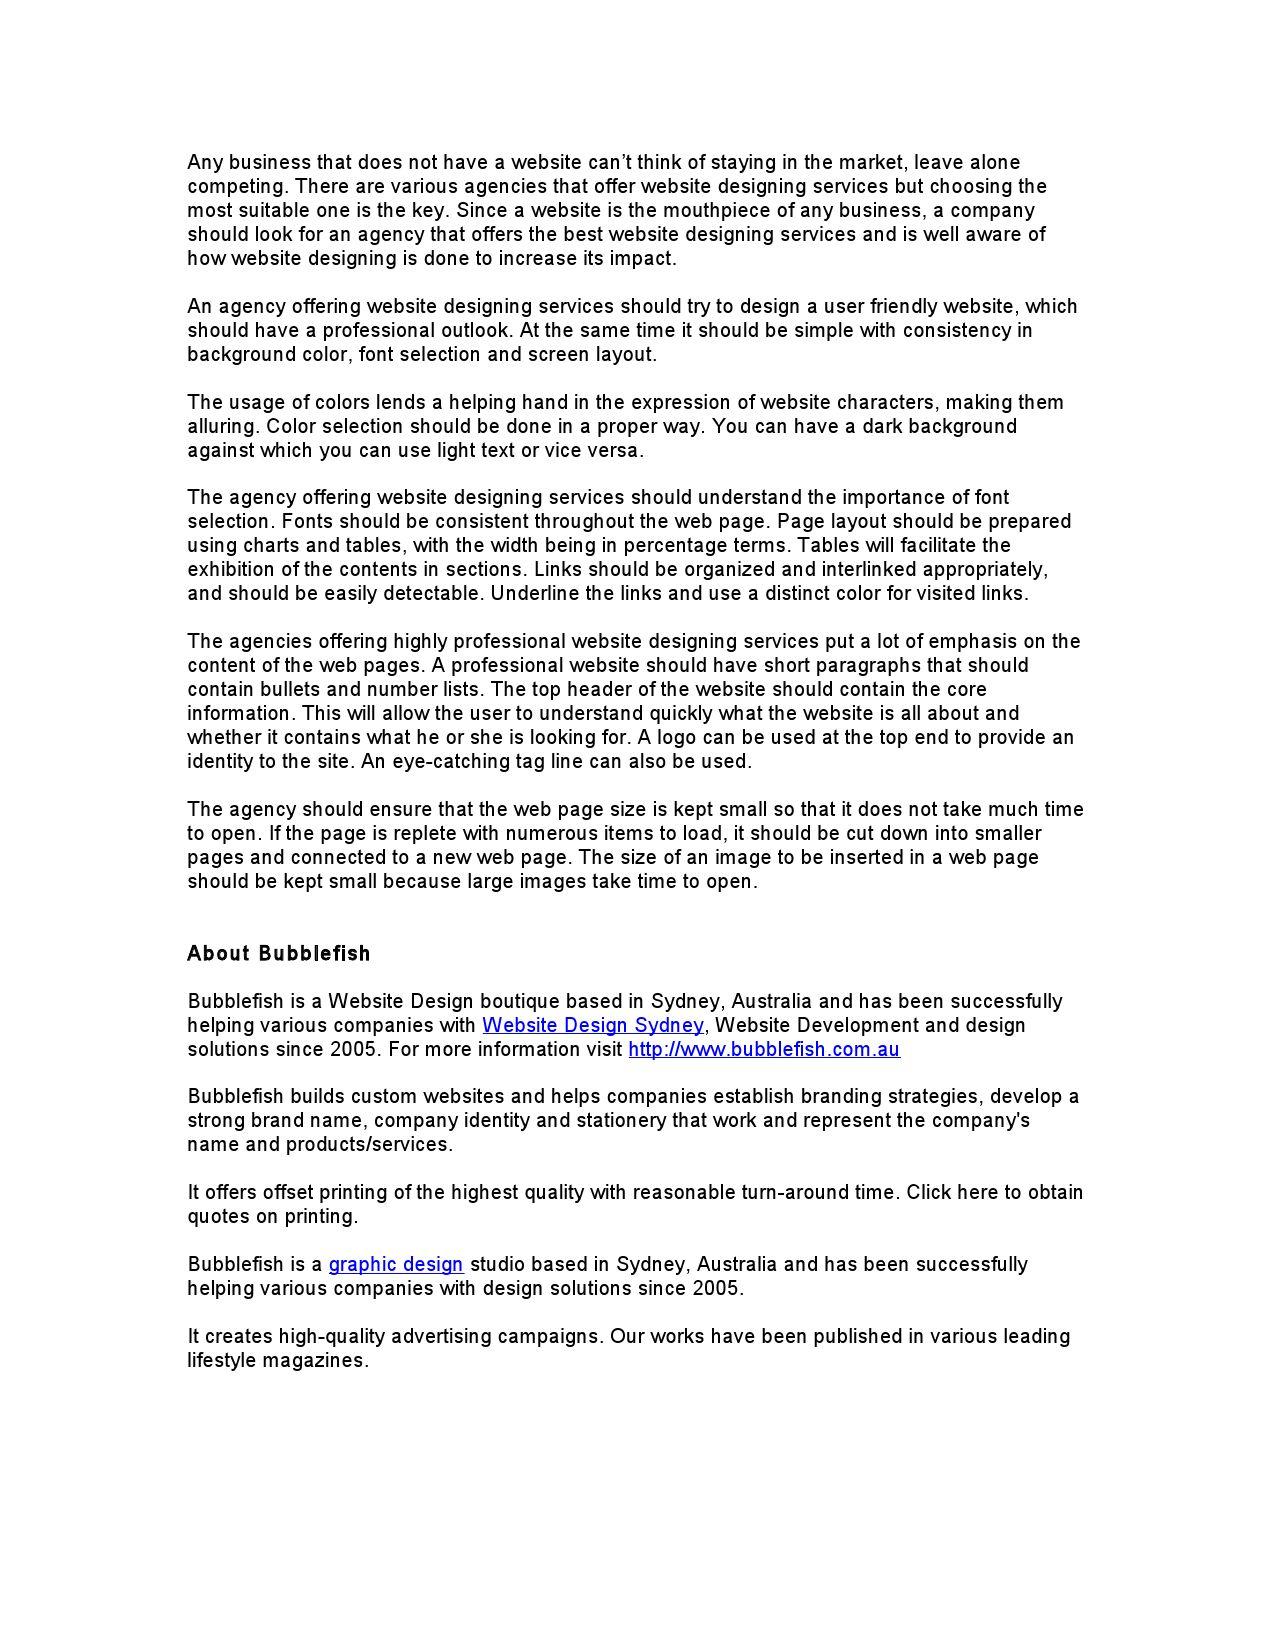 Professional Website Design Agency Bubblefish By Bubblefish Australia Issuu